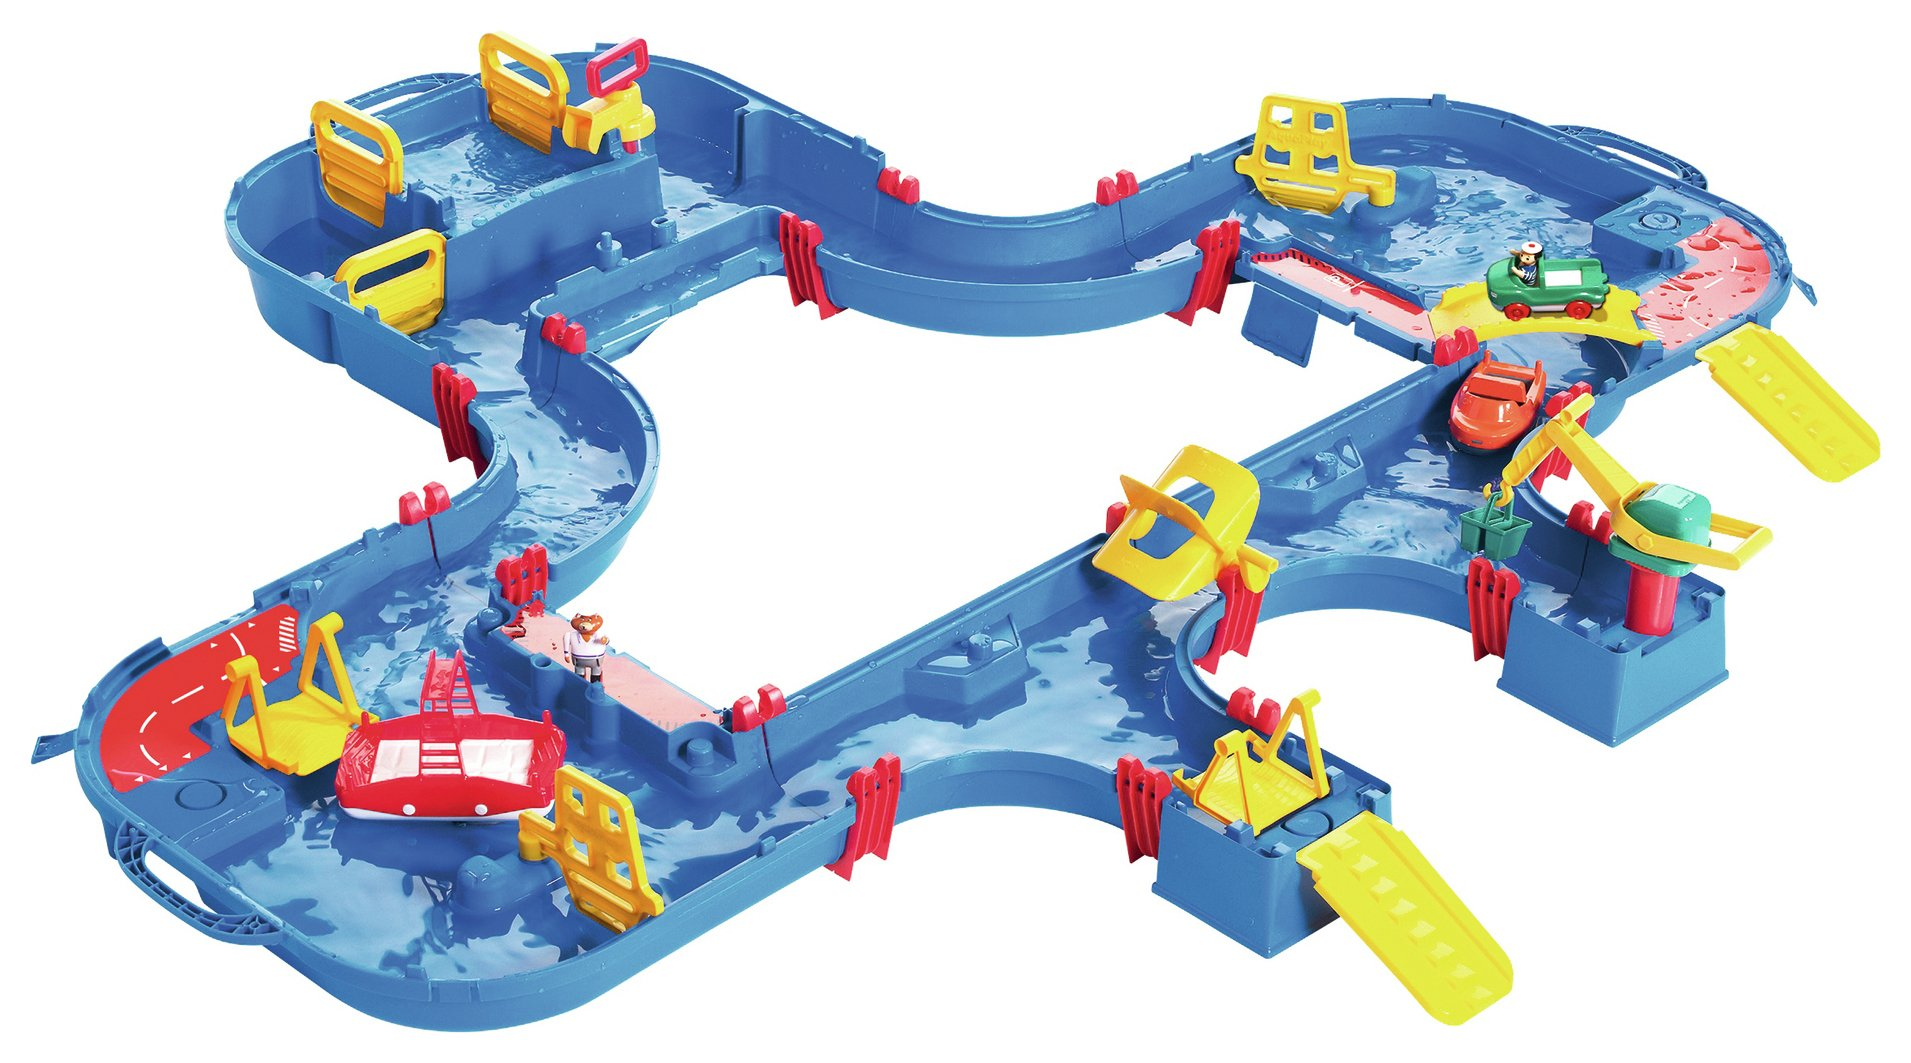 Image of Aqua Play Mega Lock.